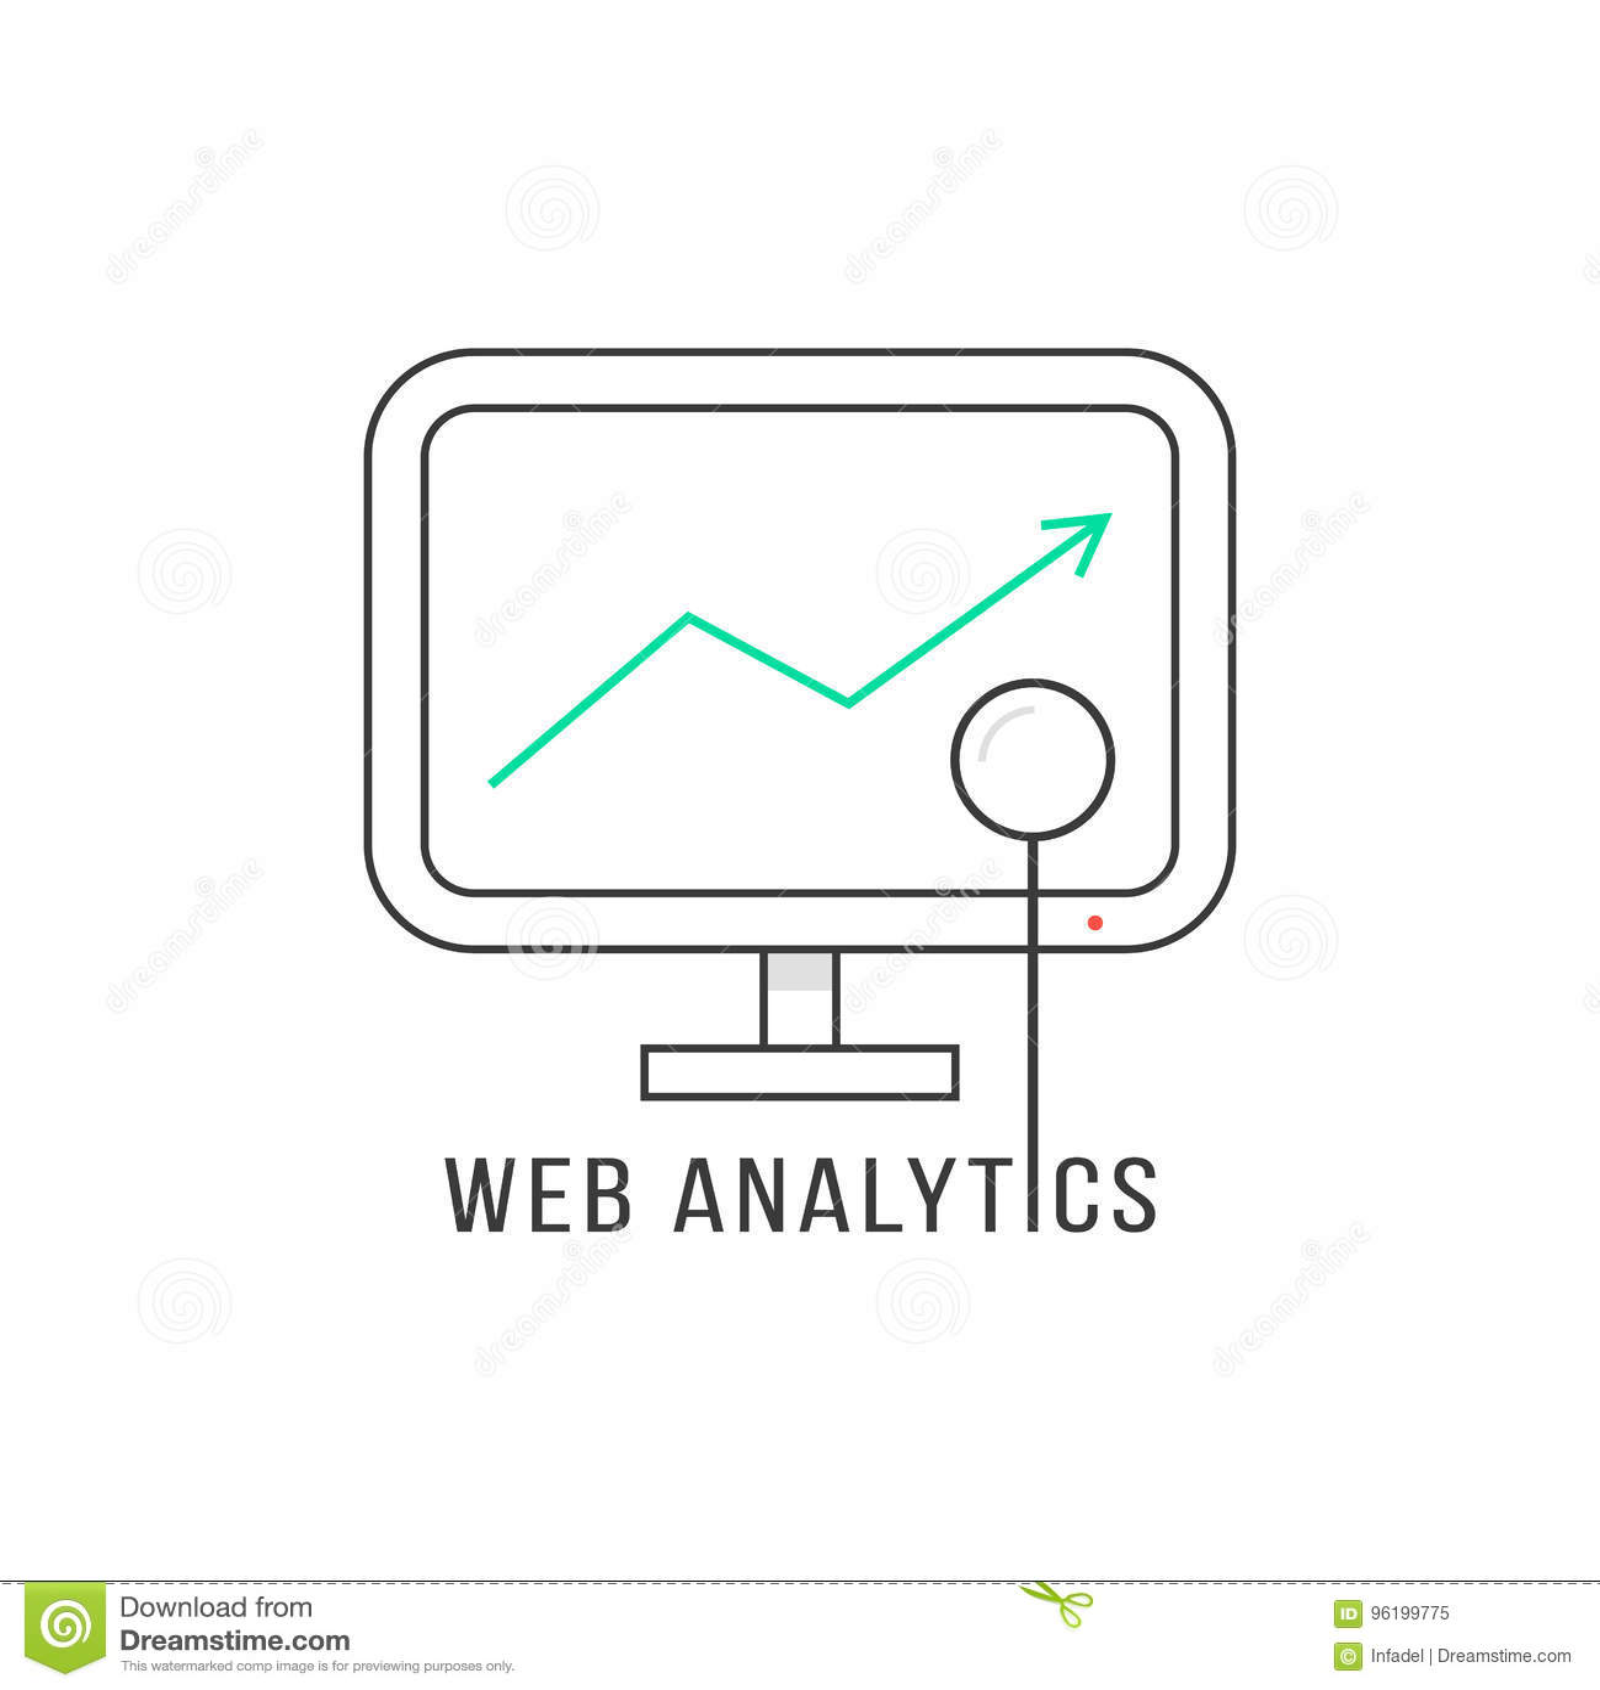 Web analytics with black thin line pc